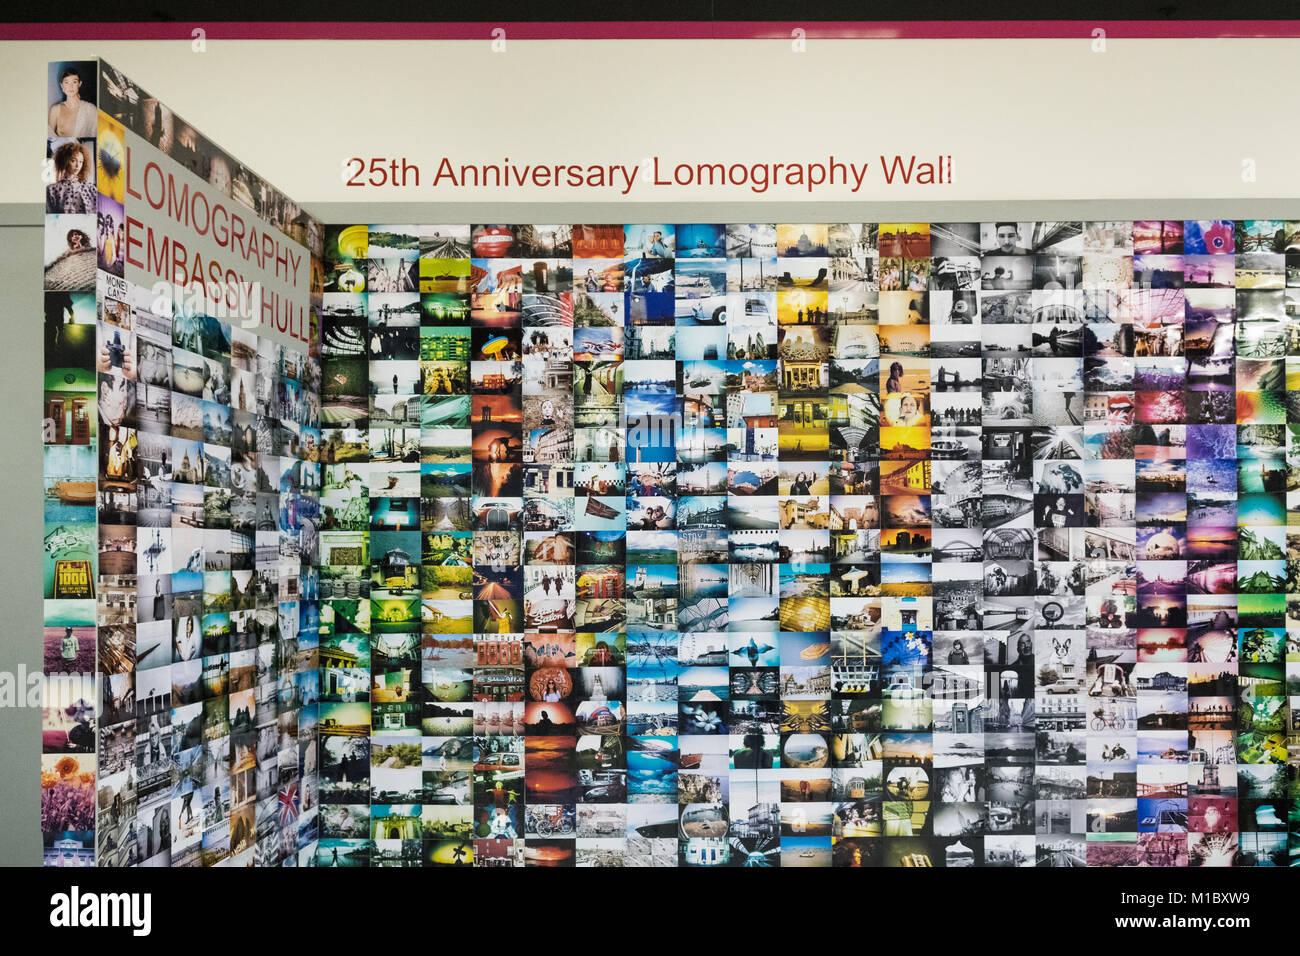 25e anniversaire Lomography mur à la Lomography Ambassade, Hull, England, UK Photo Stock